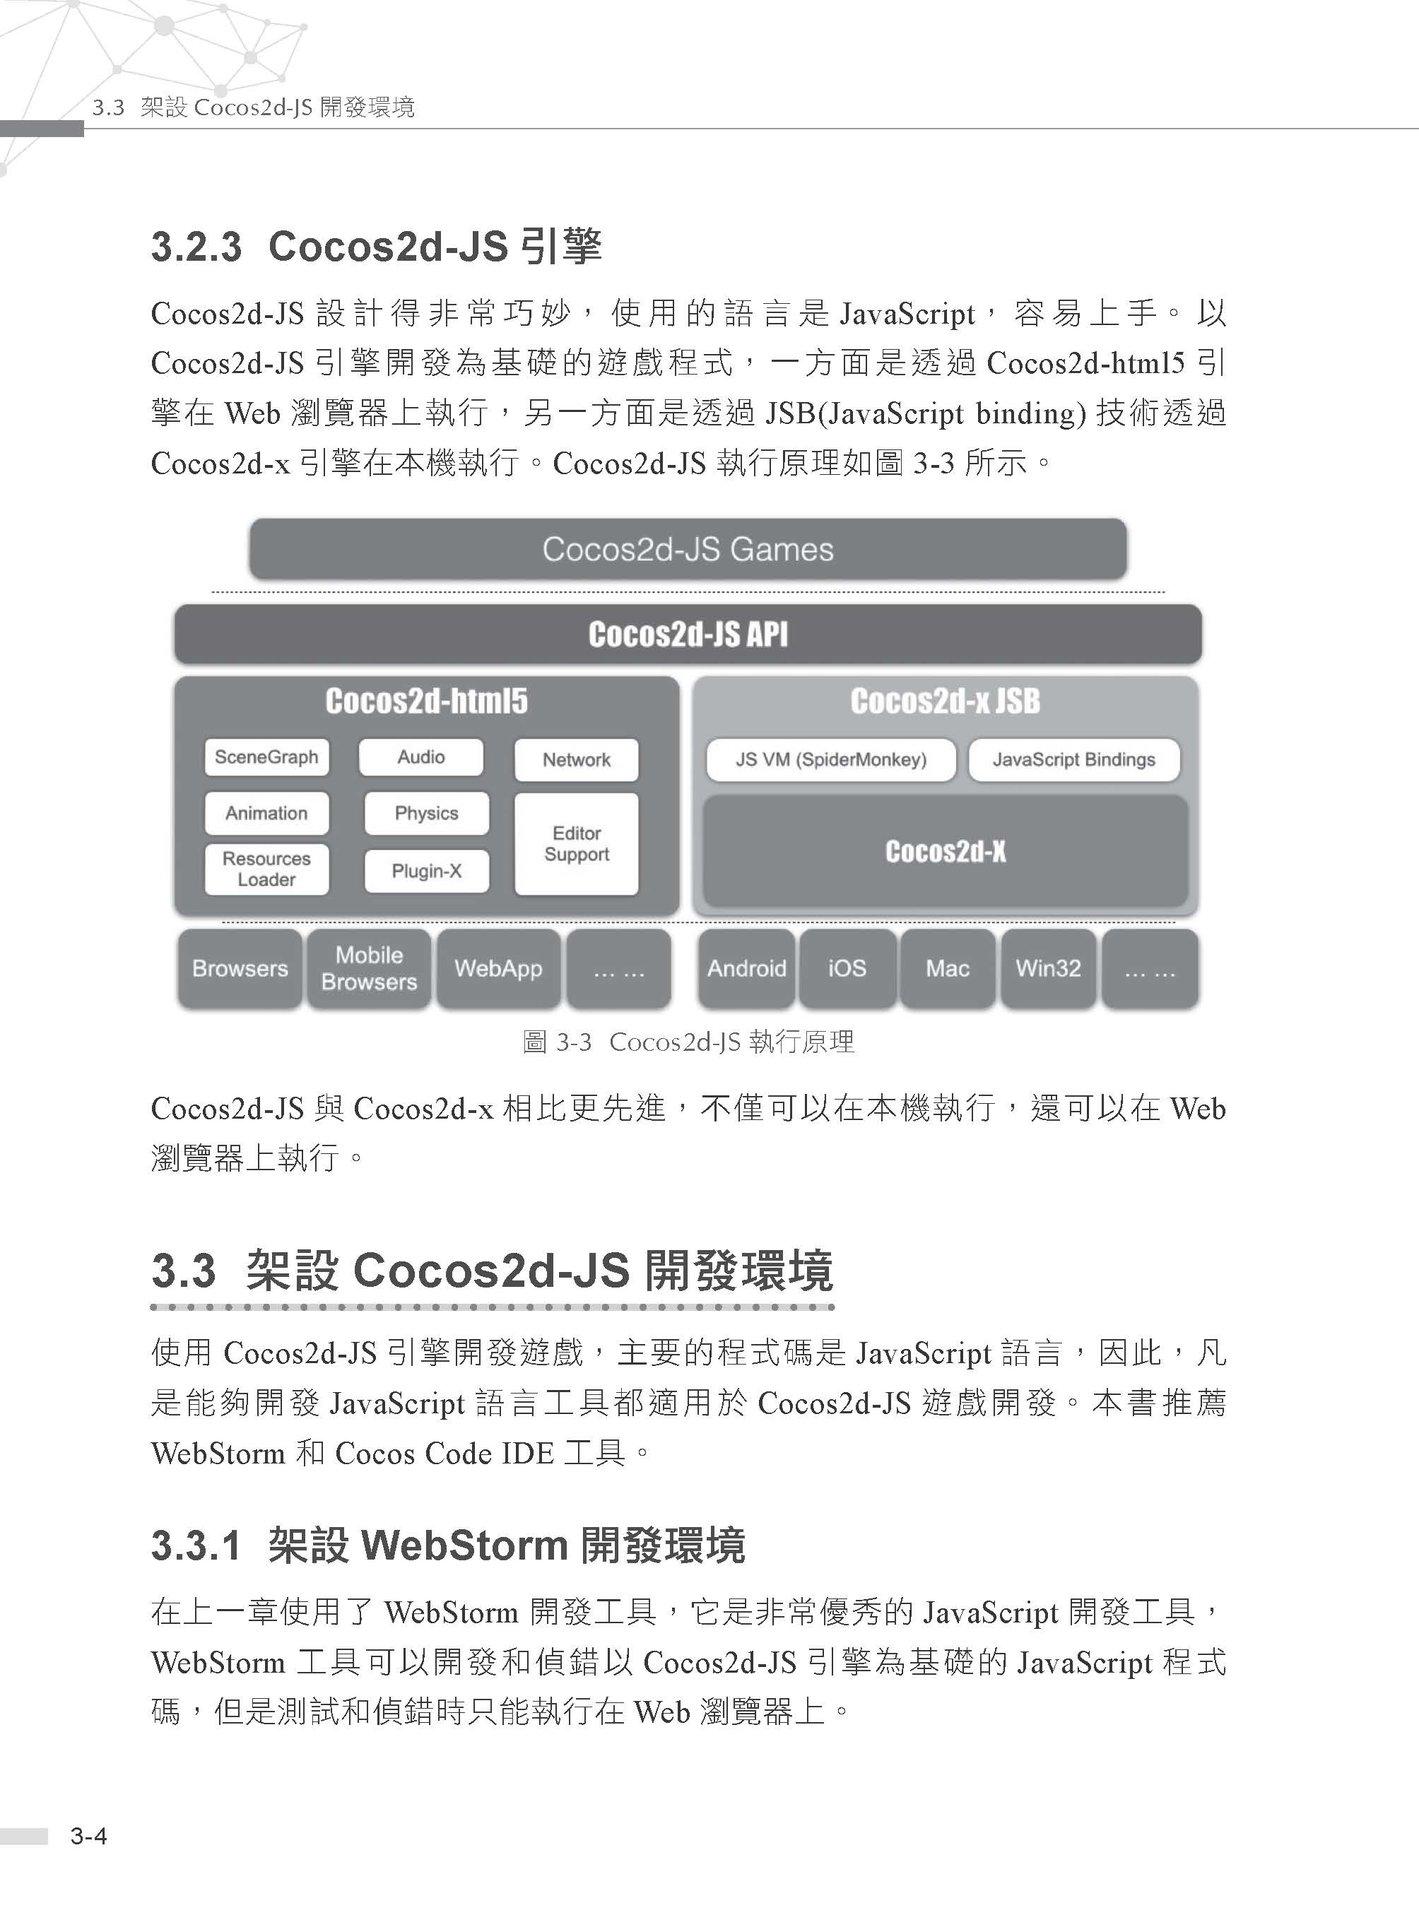 FB官方推薦跨平台遊戲引擎:Cocos2d-x 實際演練之JS篇-preview-7